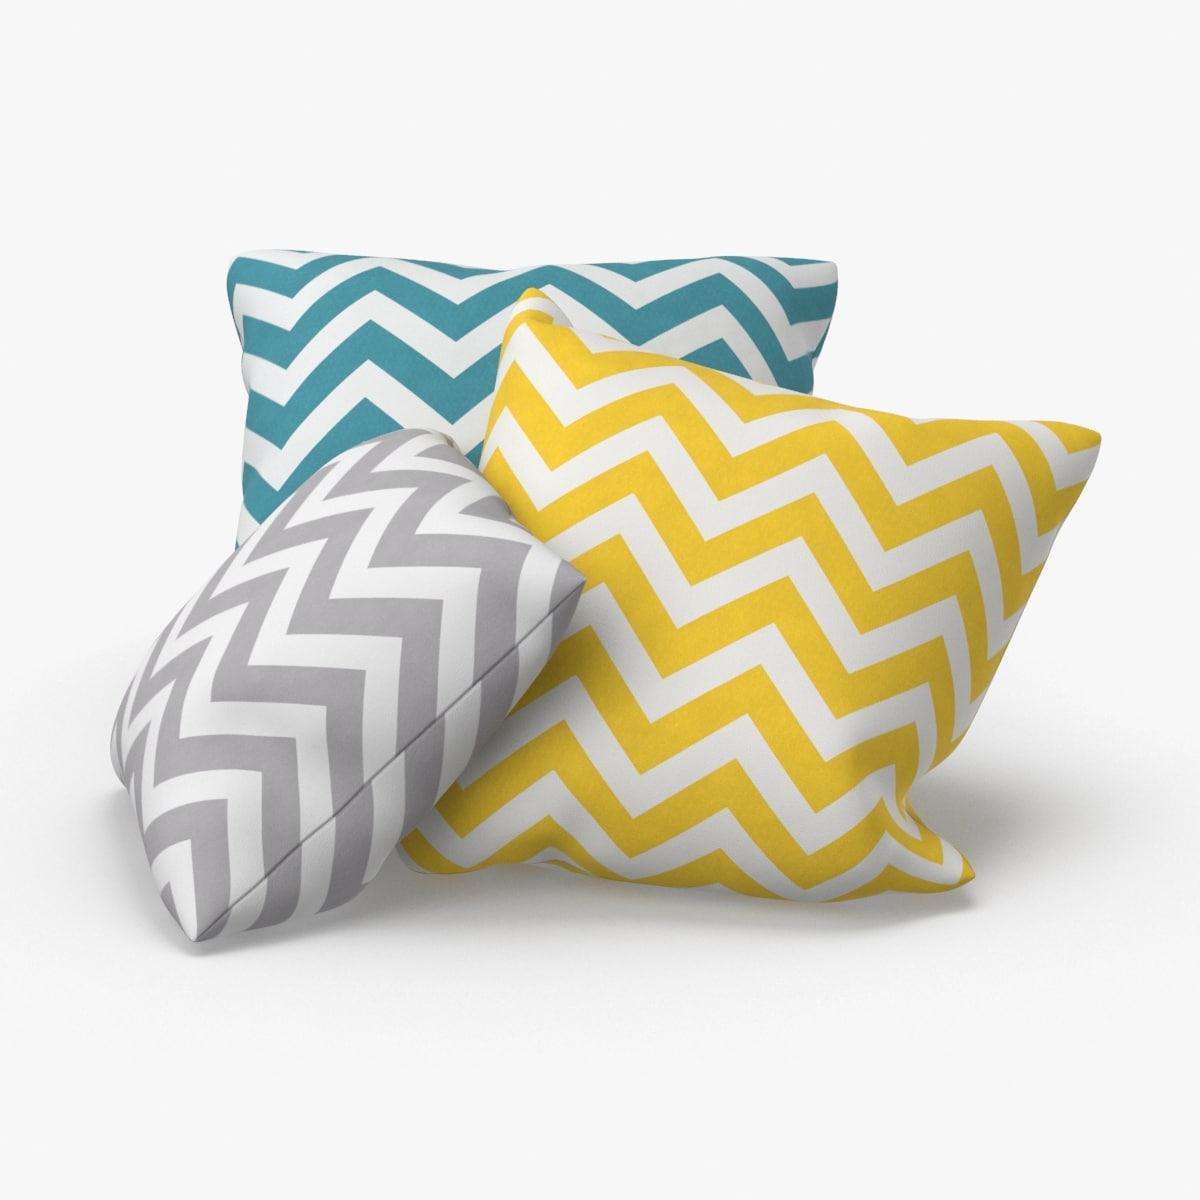 throw-pillow-02---group-blue-yellow-gray 3D model